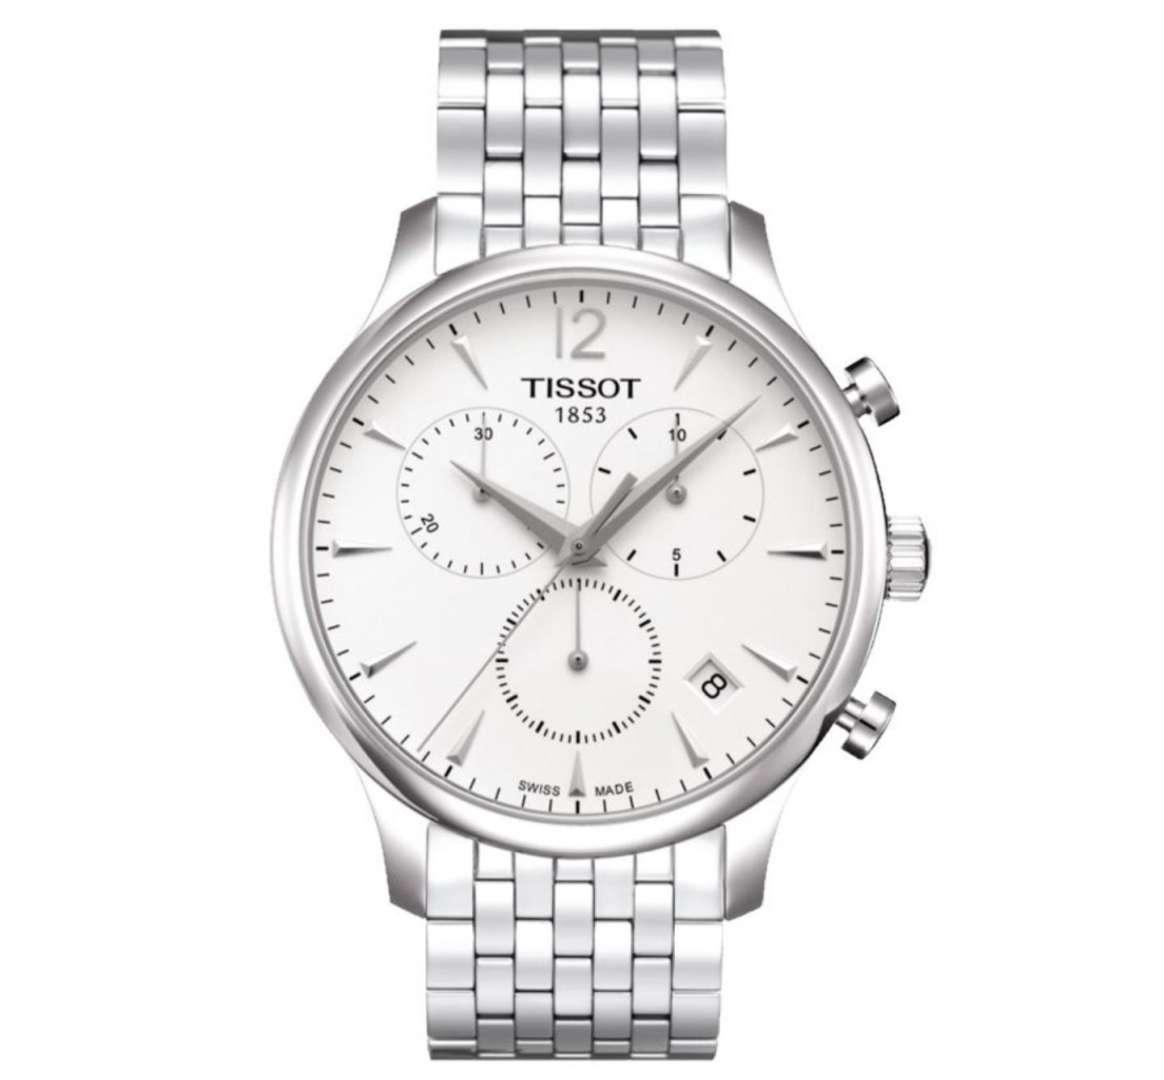 שעון יד אנלוגי tissot t063.617.11.037.00 טיסו